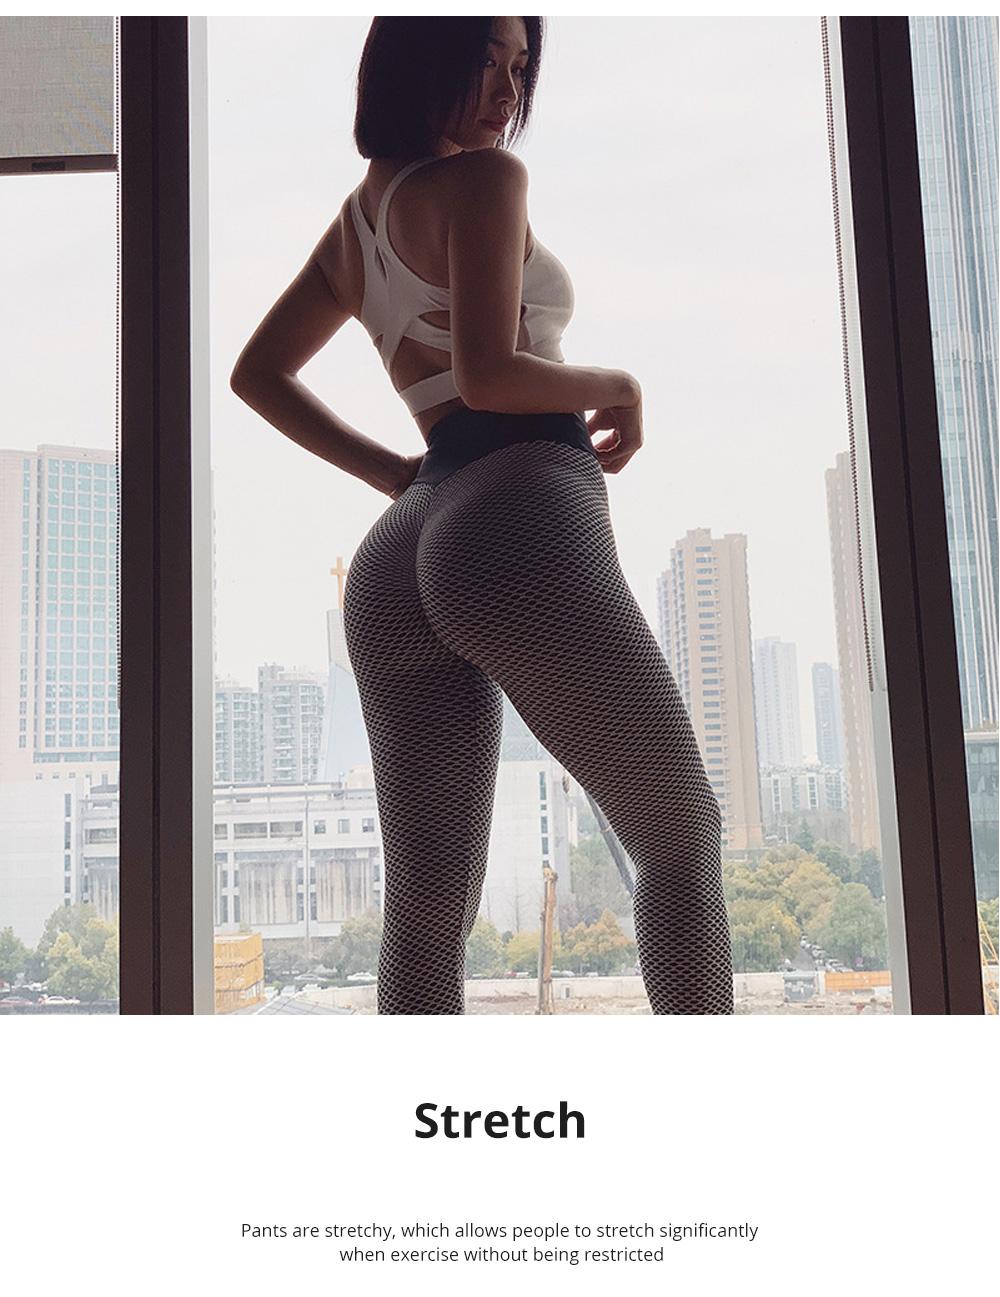 Women Wearing Tight Yoga Pants Fitness Seamless High Quality Workout Leggings High Waist Stretch Sports Yoga Pants 3